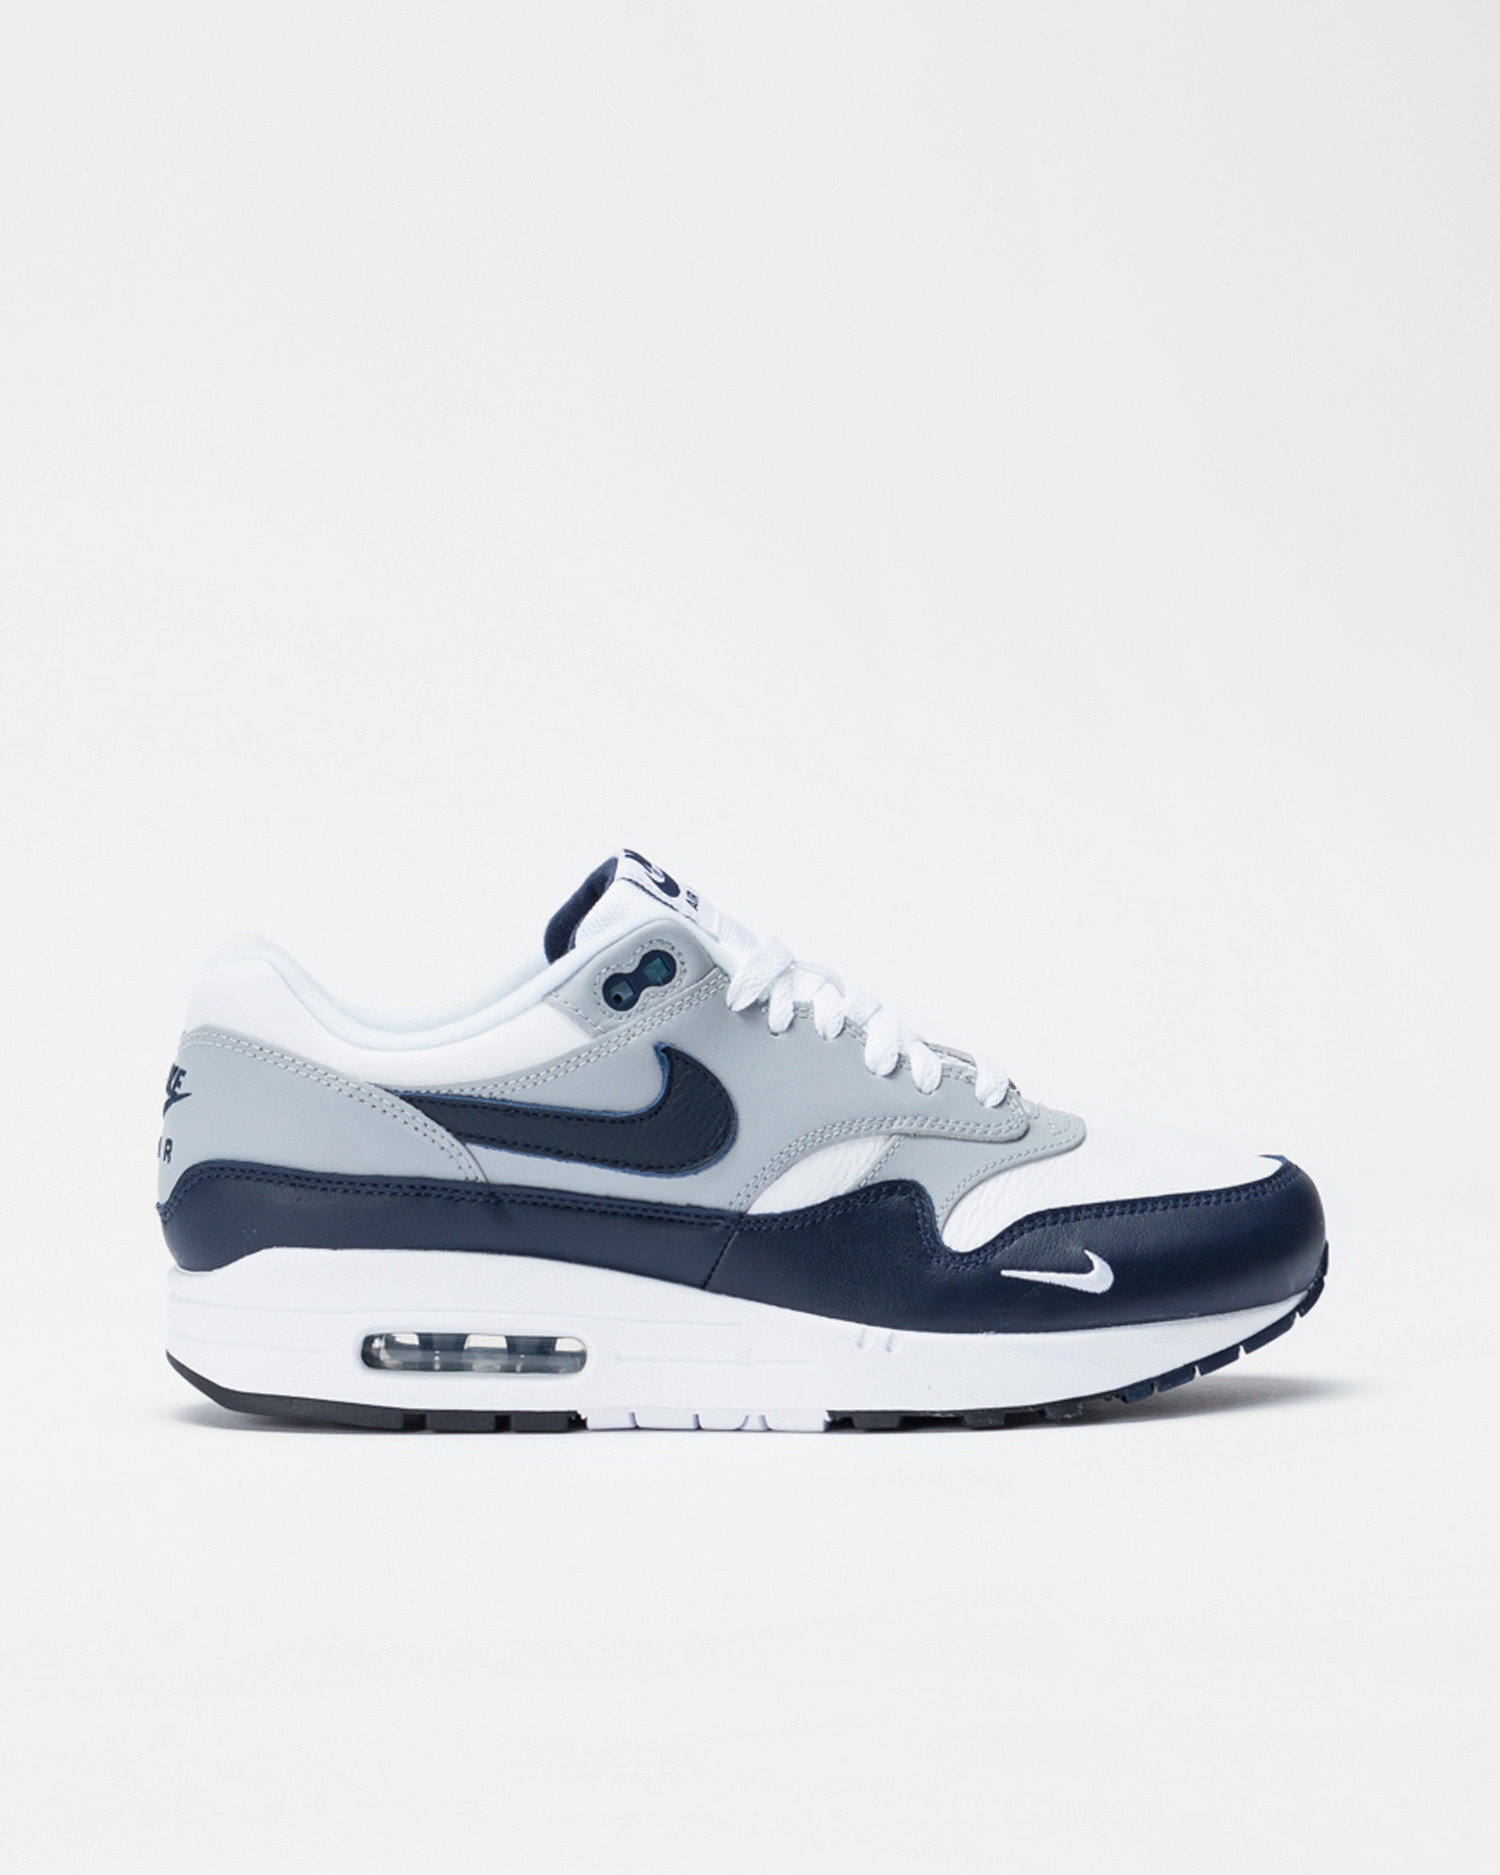 Nike air max 1 lv8 White/obsidian-wolf grey-black